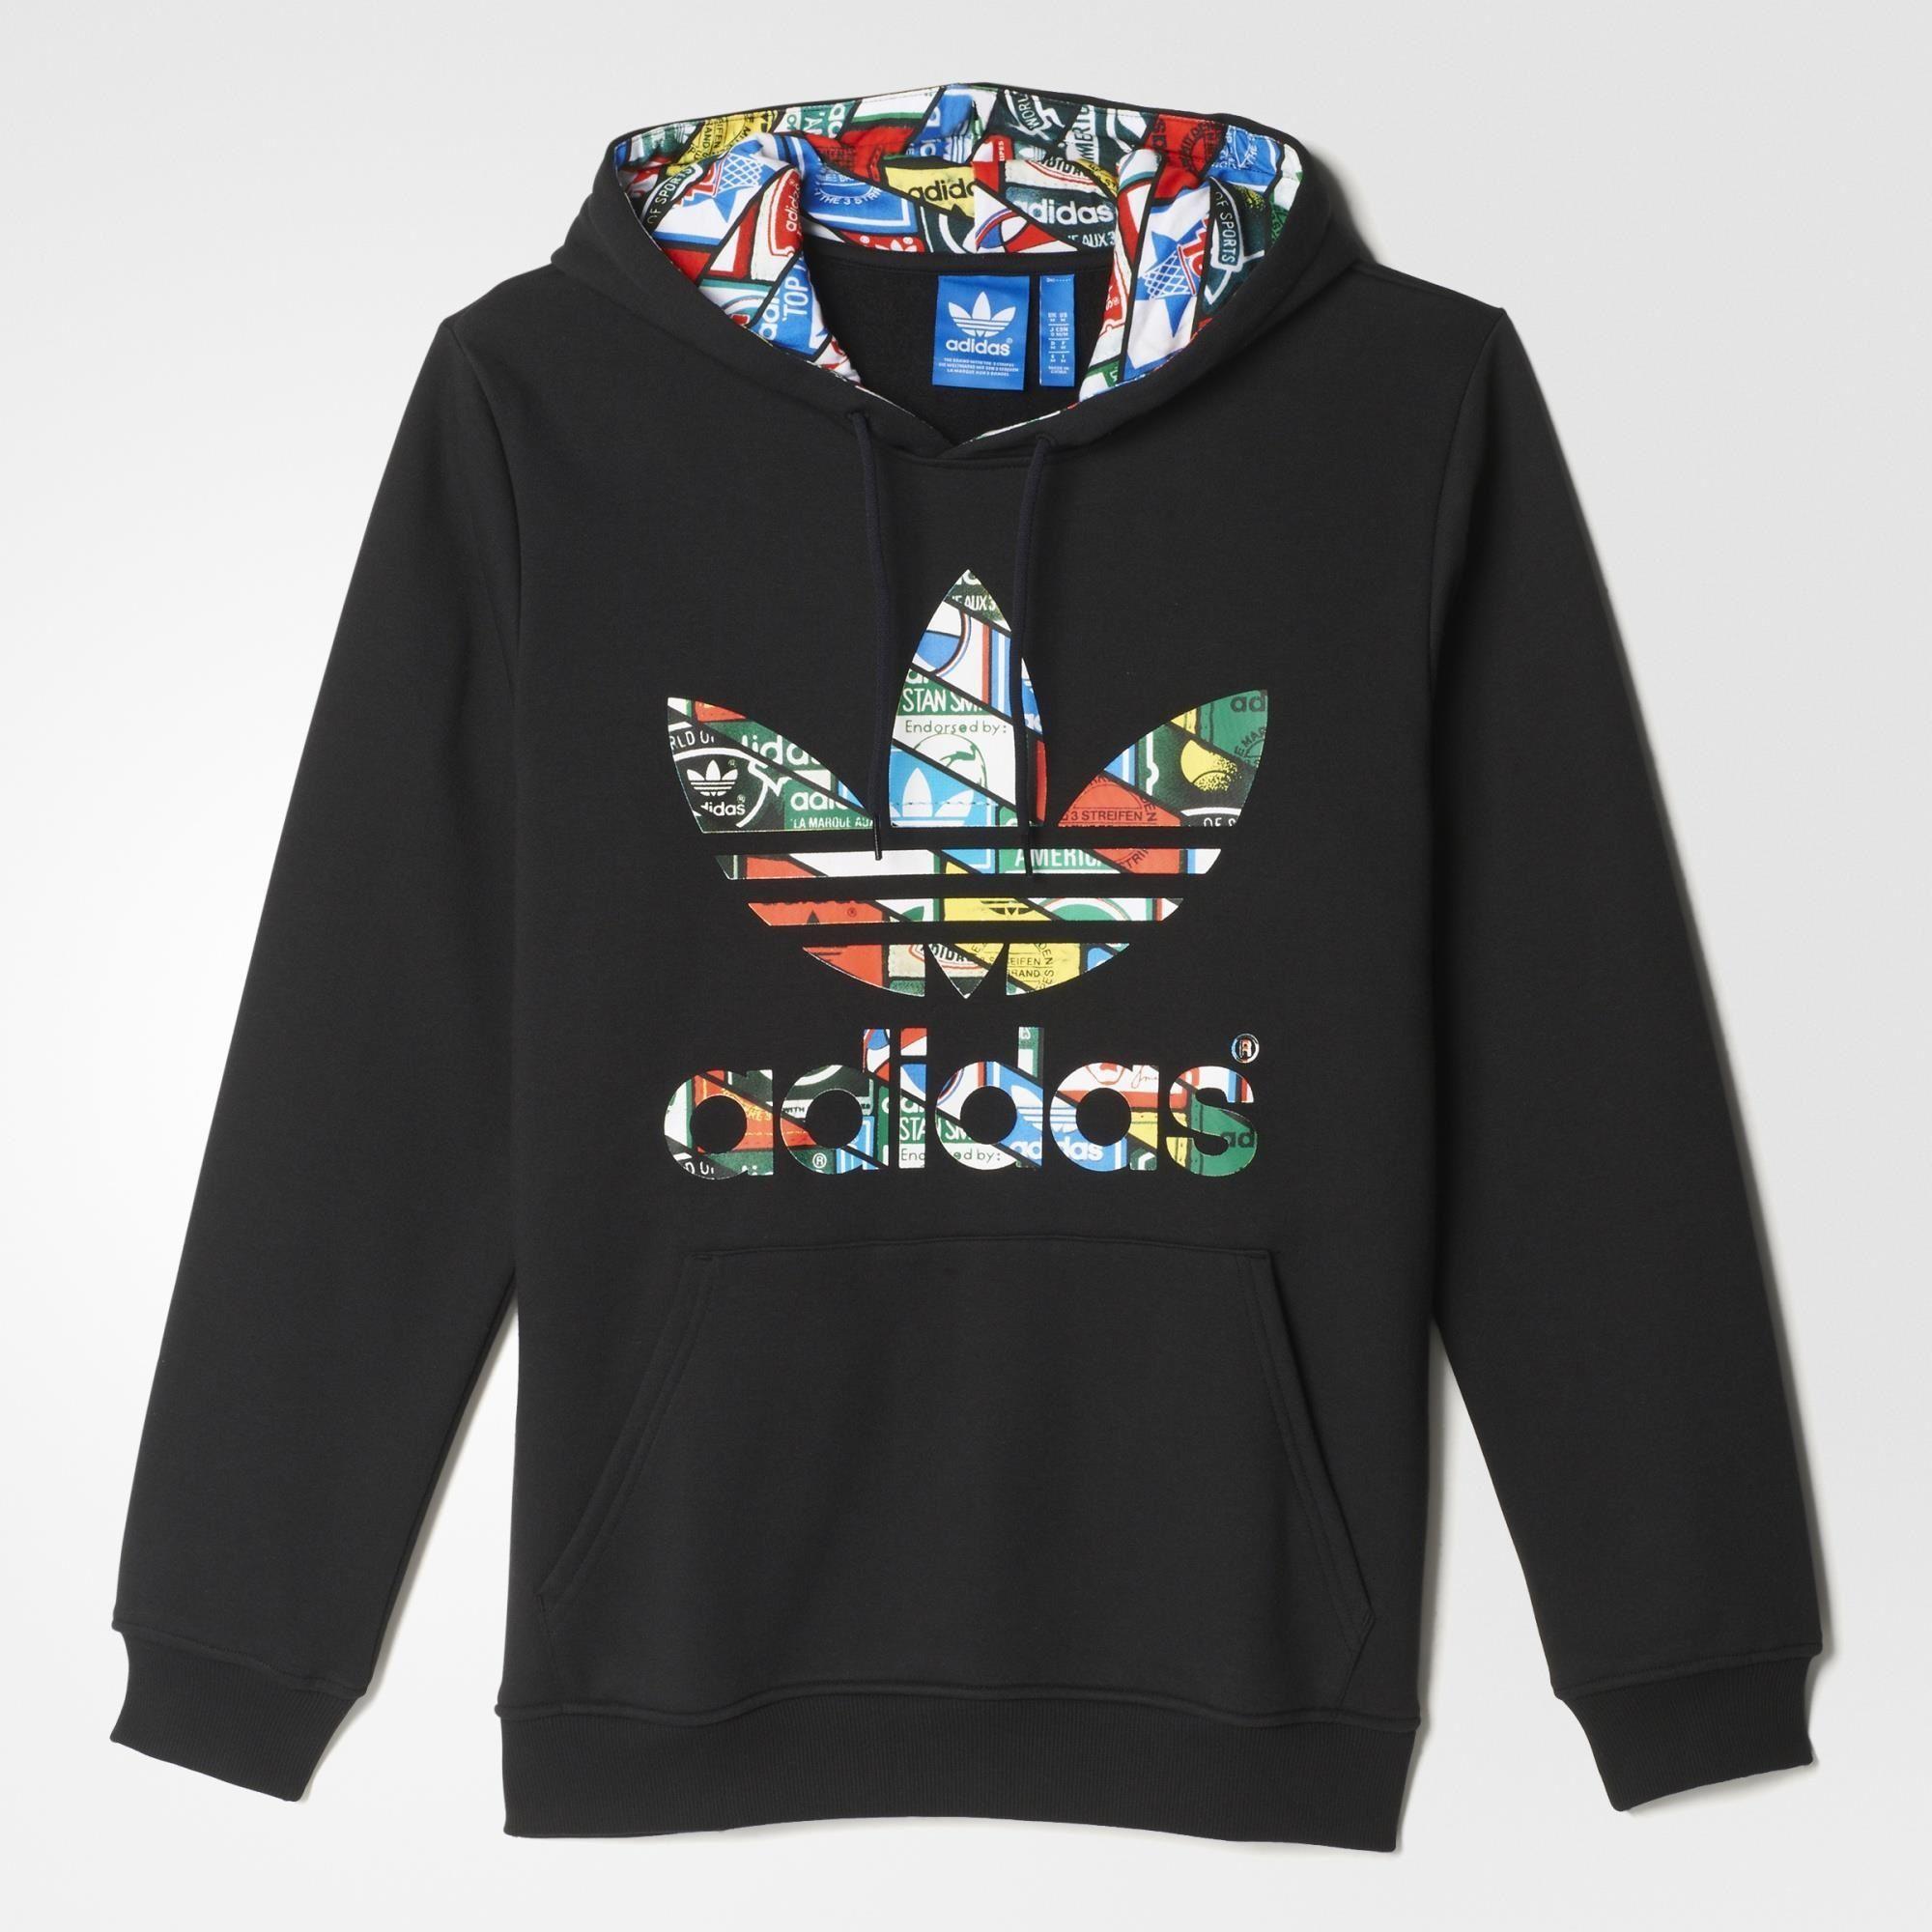 Details about Adidas Hooded Sweatshirt Condivo 14 Training Shirt Hoody show original title